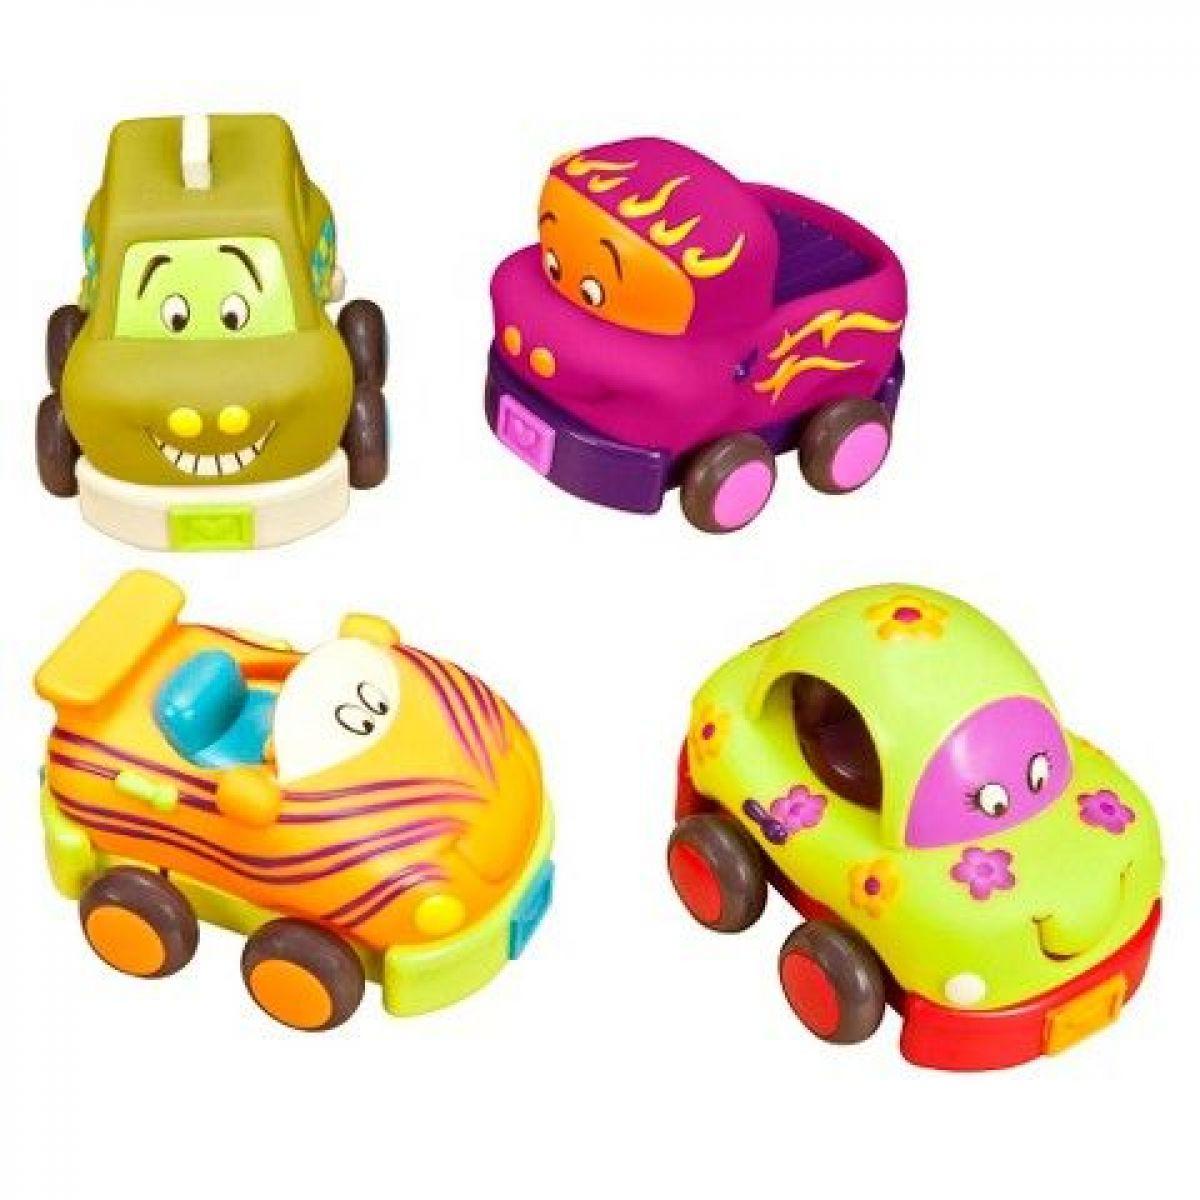 B.TOYS autíčko WHEEEE-IS! Formule/Oranžová B.Toys